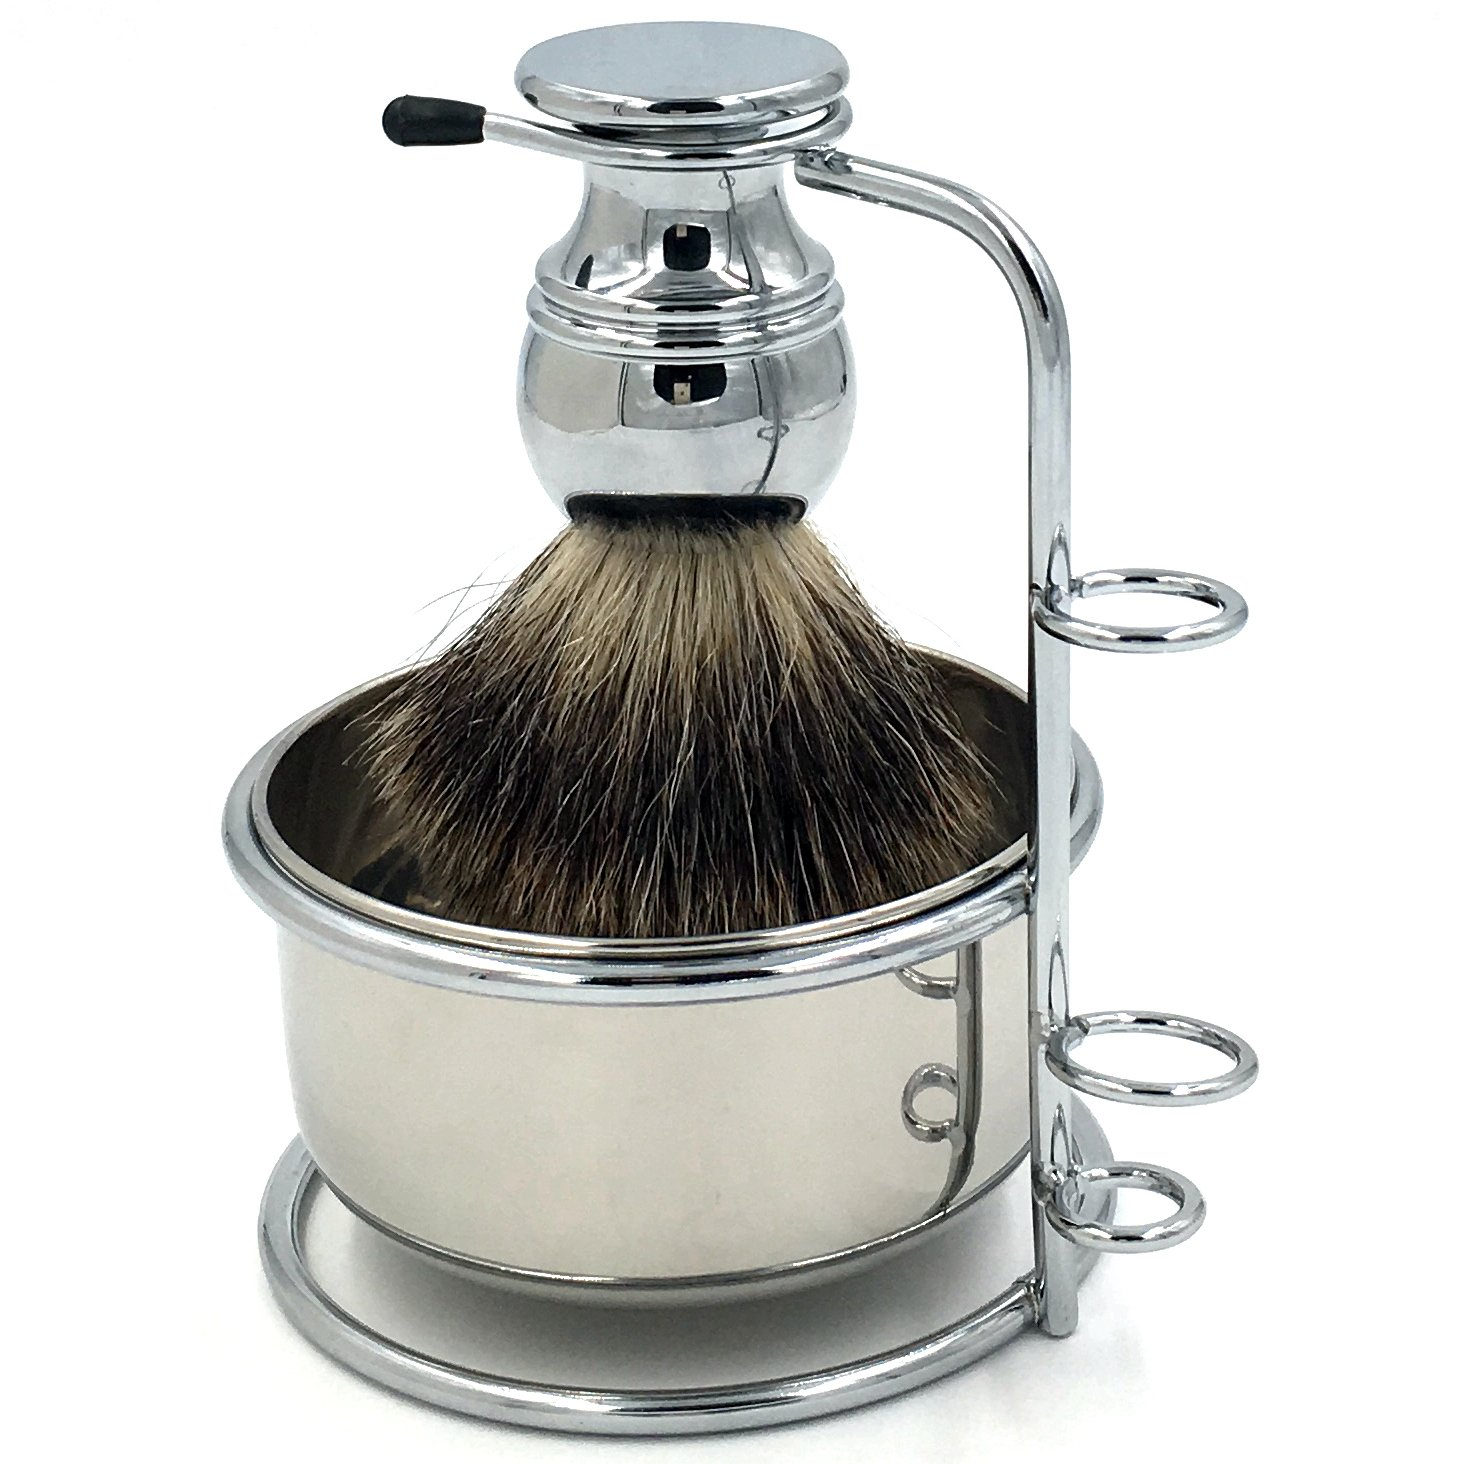 Safety Razor Shaving Kit: Genuine Badger Brush - Outstanding Quality Elegant Silvery Alloy Brush Handle + Beautiful Stainless Steel Shaving Soap Bowl and Razor Brush Stand, The Best Gift for Gent Mens Shanwo